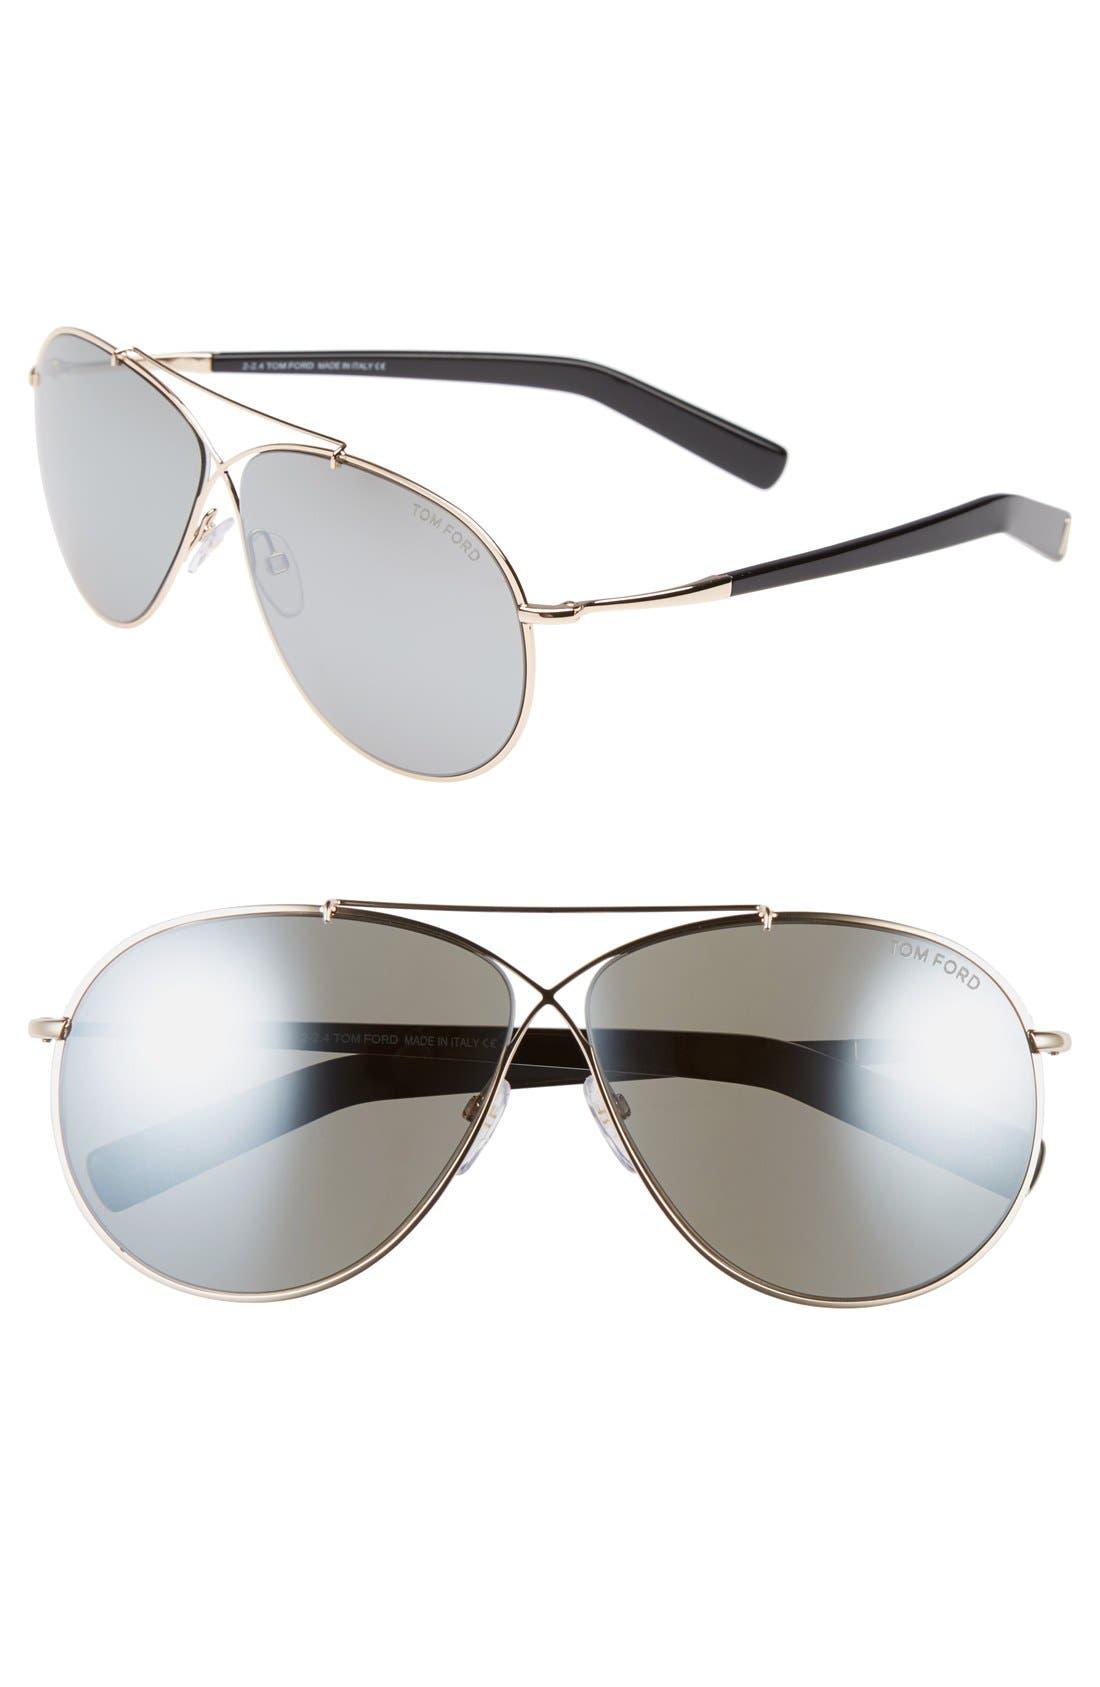 Alternate Image 1 Selected - Tom Ford 'Eva' 61mm Aviator Sunglasses